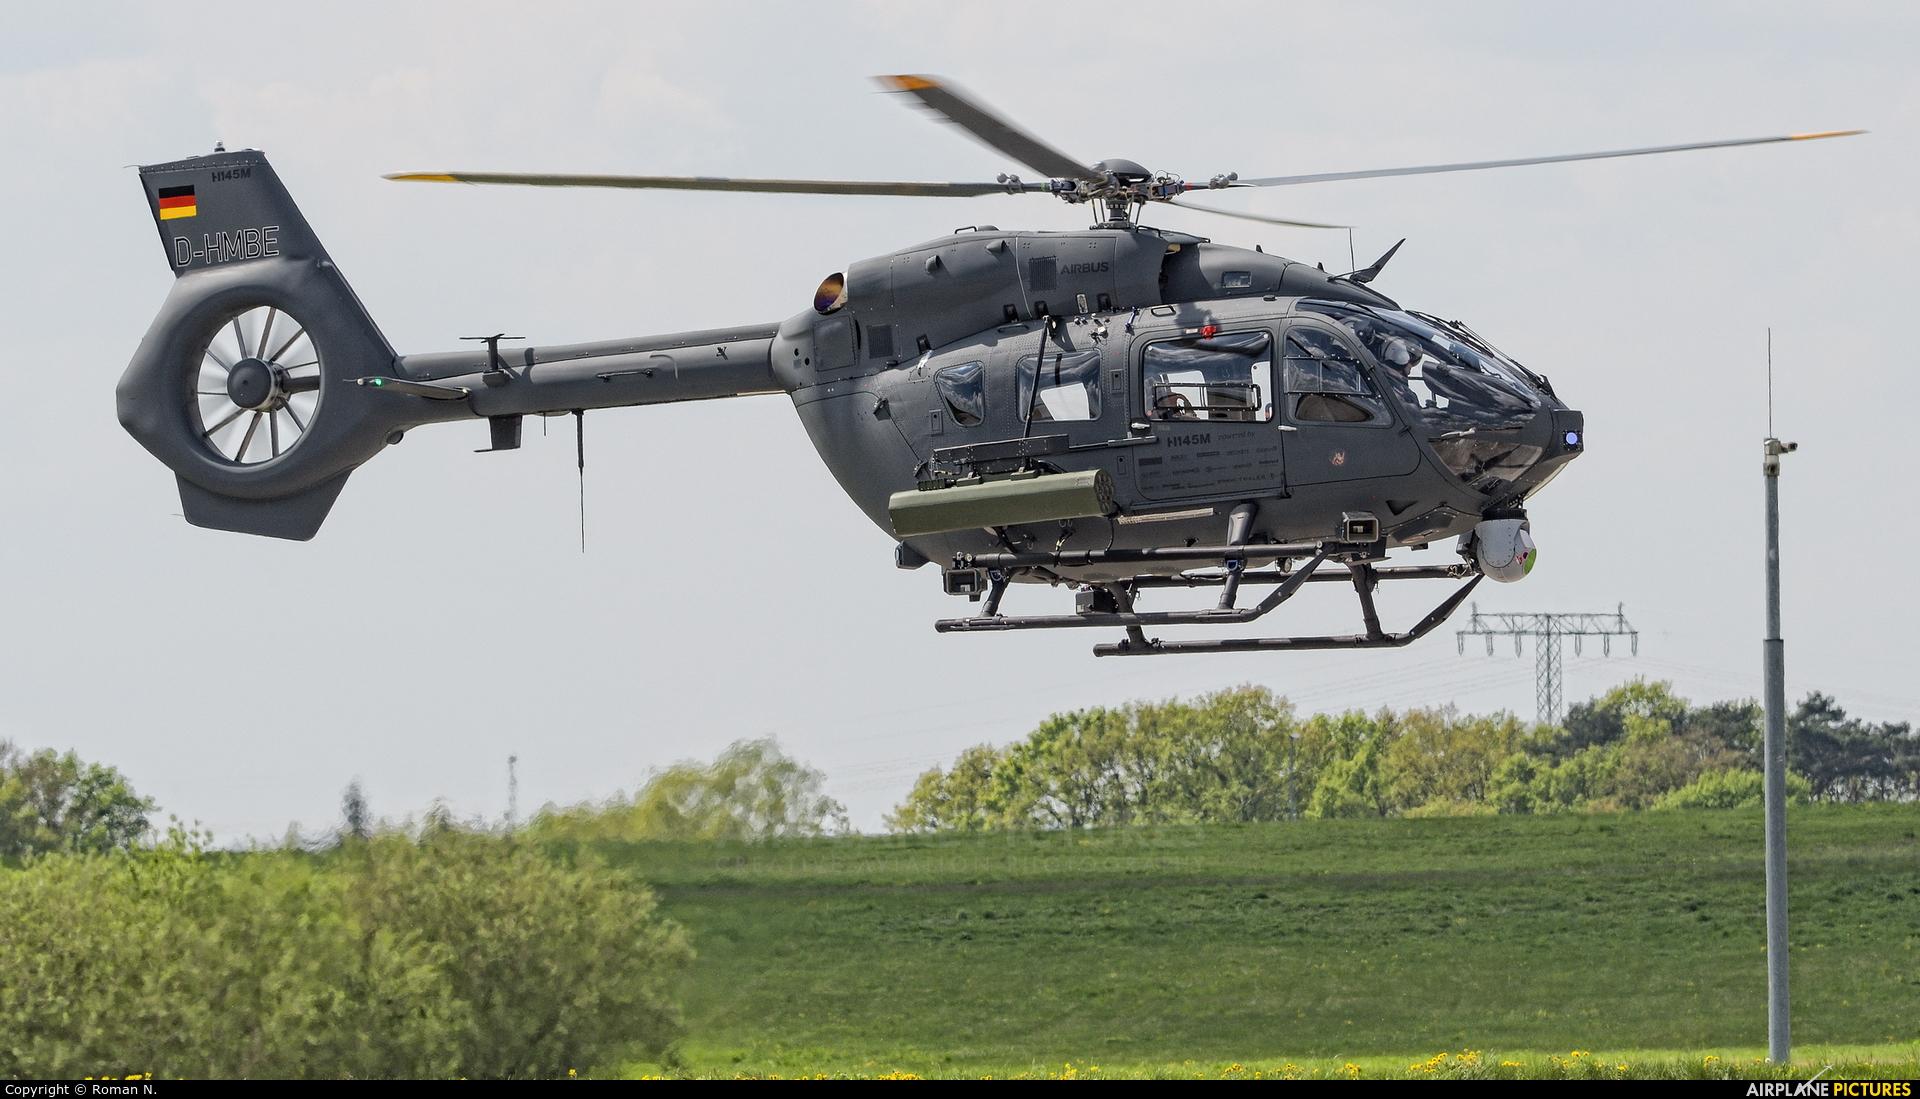 Eurocopter Deutschland GmbH D-HMBE aircraft at Berlin - Schönefeld